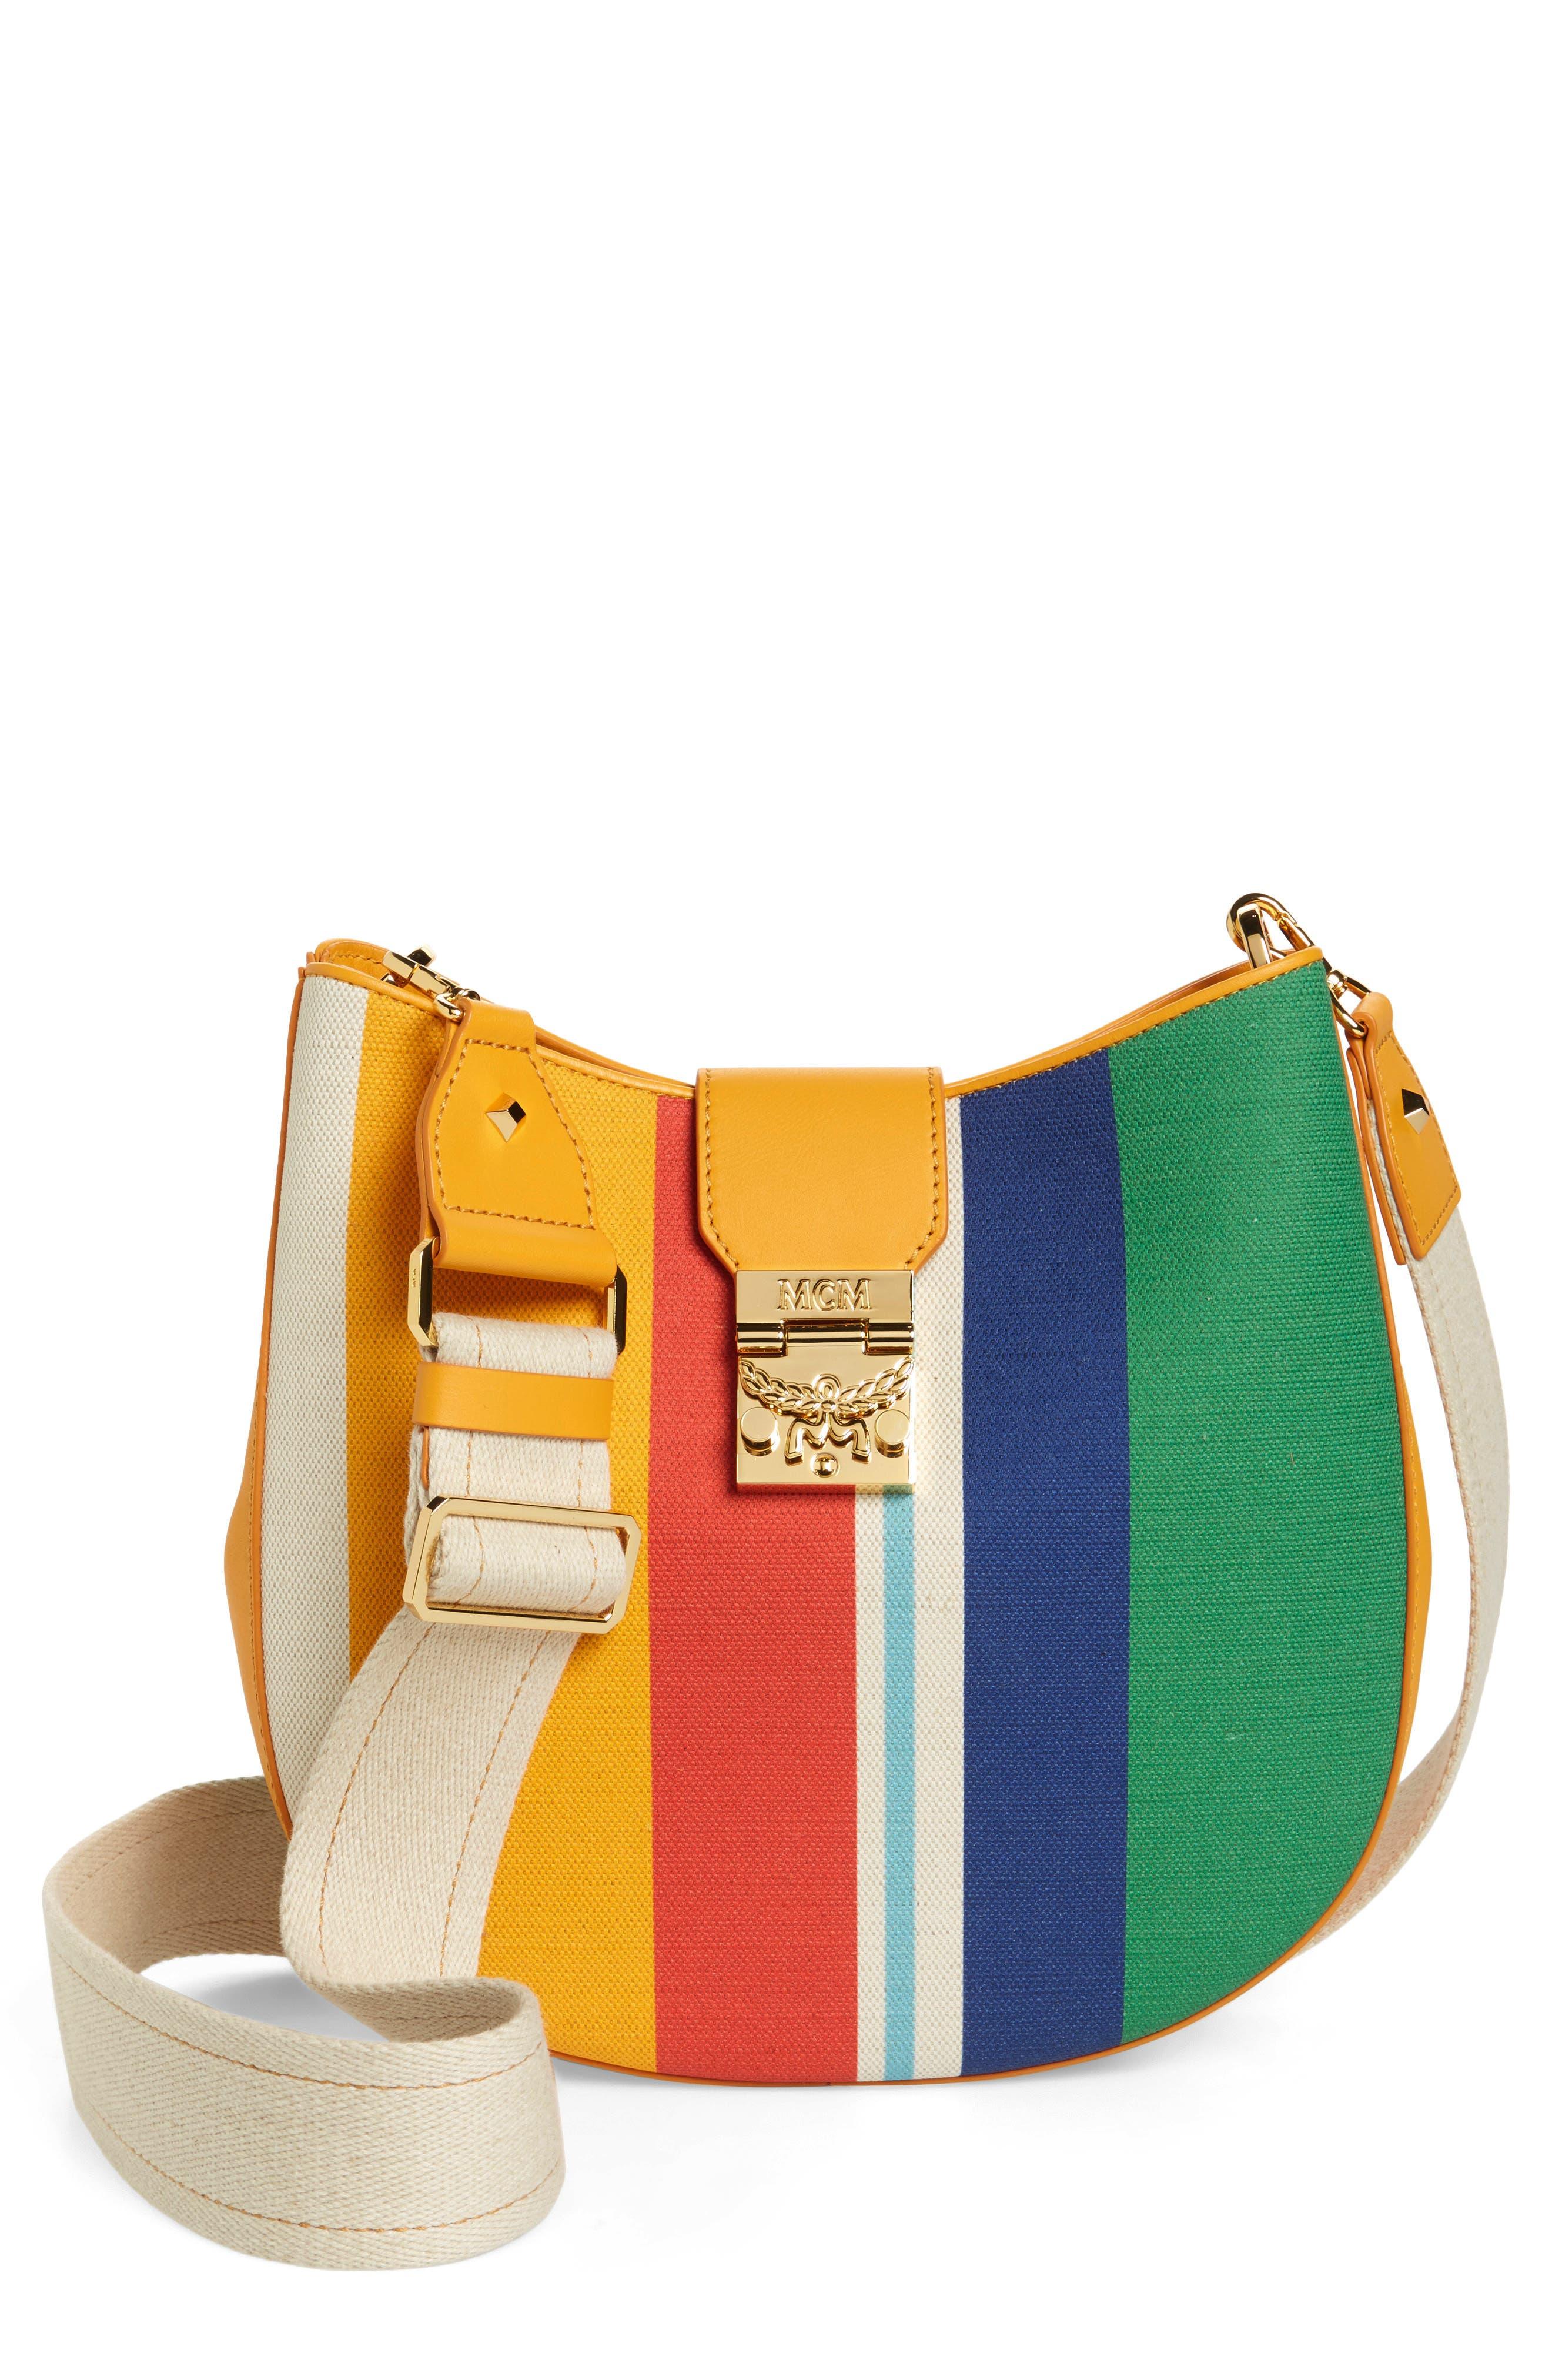 Medium Patricia Canvas Hobo Bag,                         Main,                         color, 708